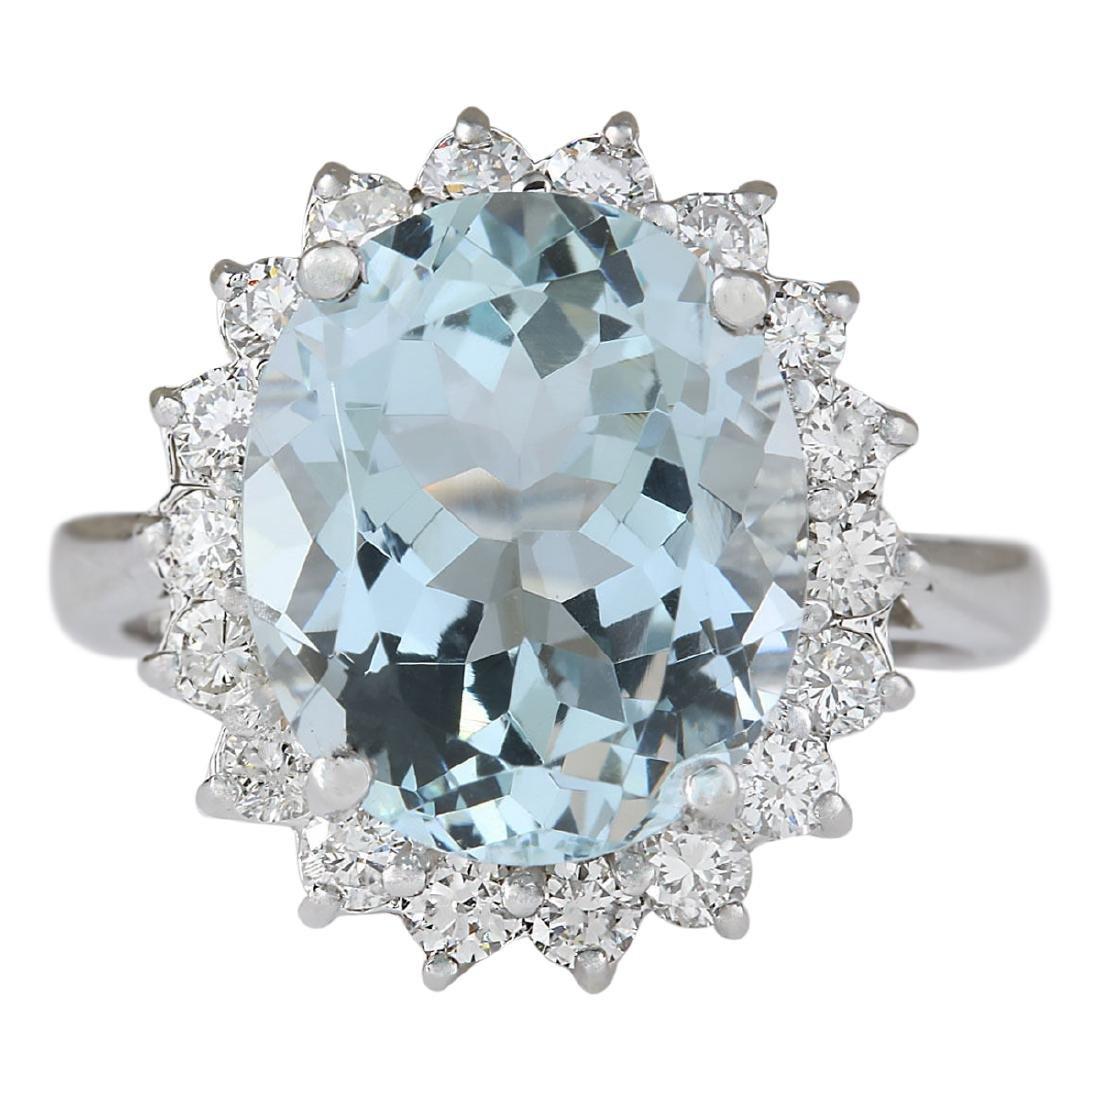 6.80 CTW Natural Aquamarine And Diamond Ring In 18K